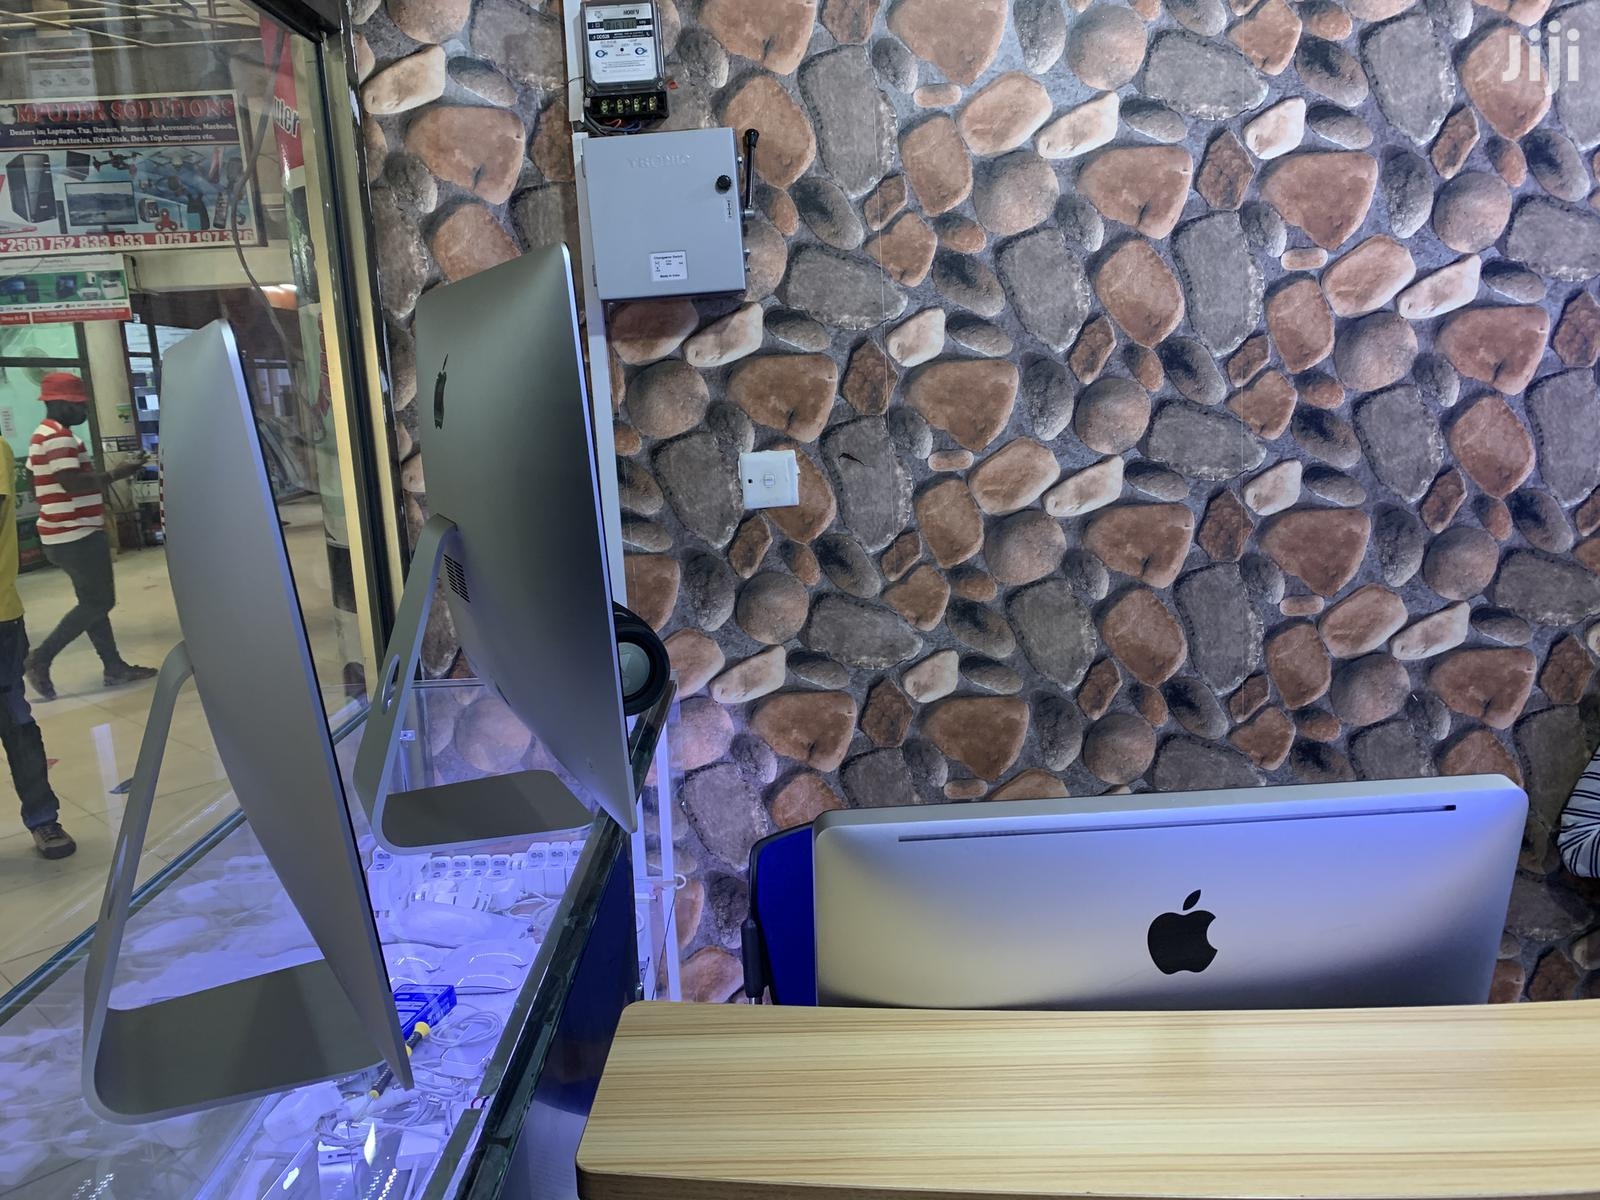 Desktop Computer Apple iMac 8GB Intel Core i5 HDD 1T | Laptops & Computers for sale in Kampala, Central Region, Uganda